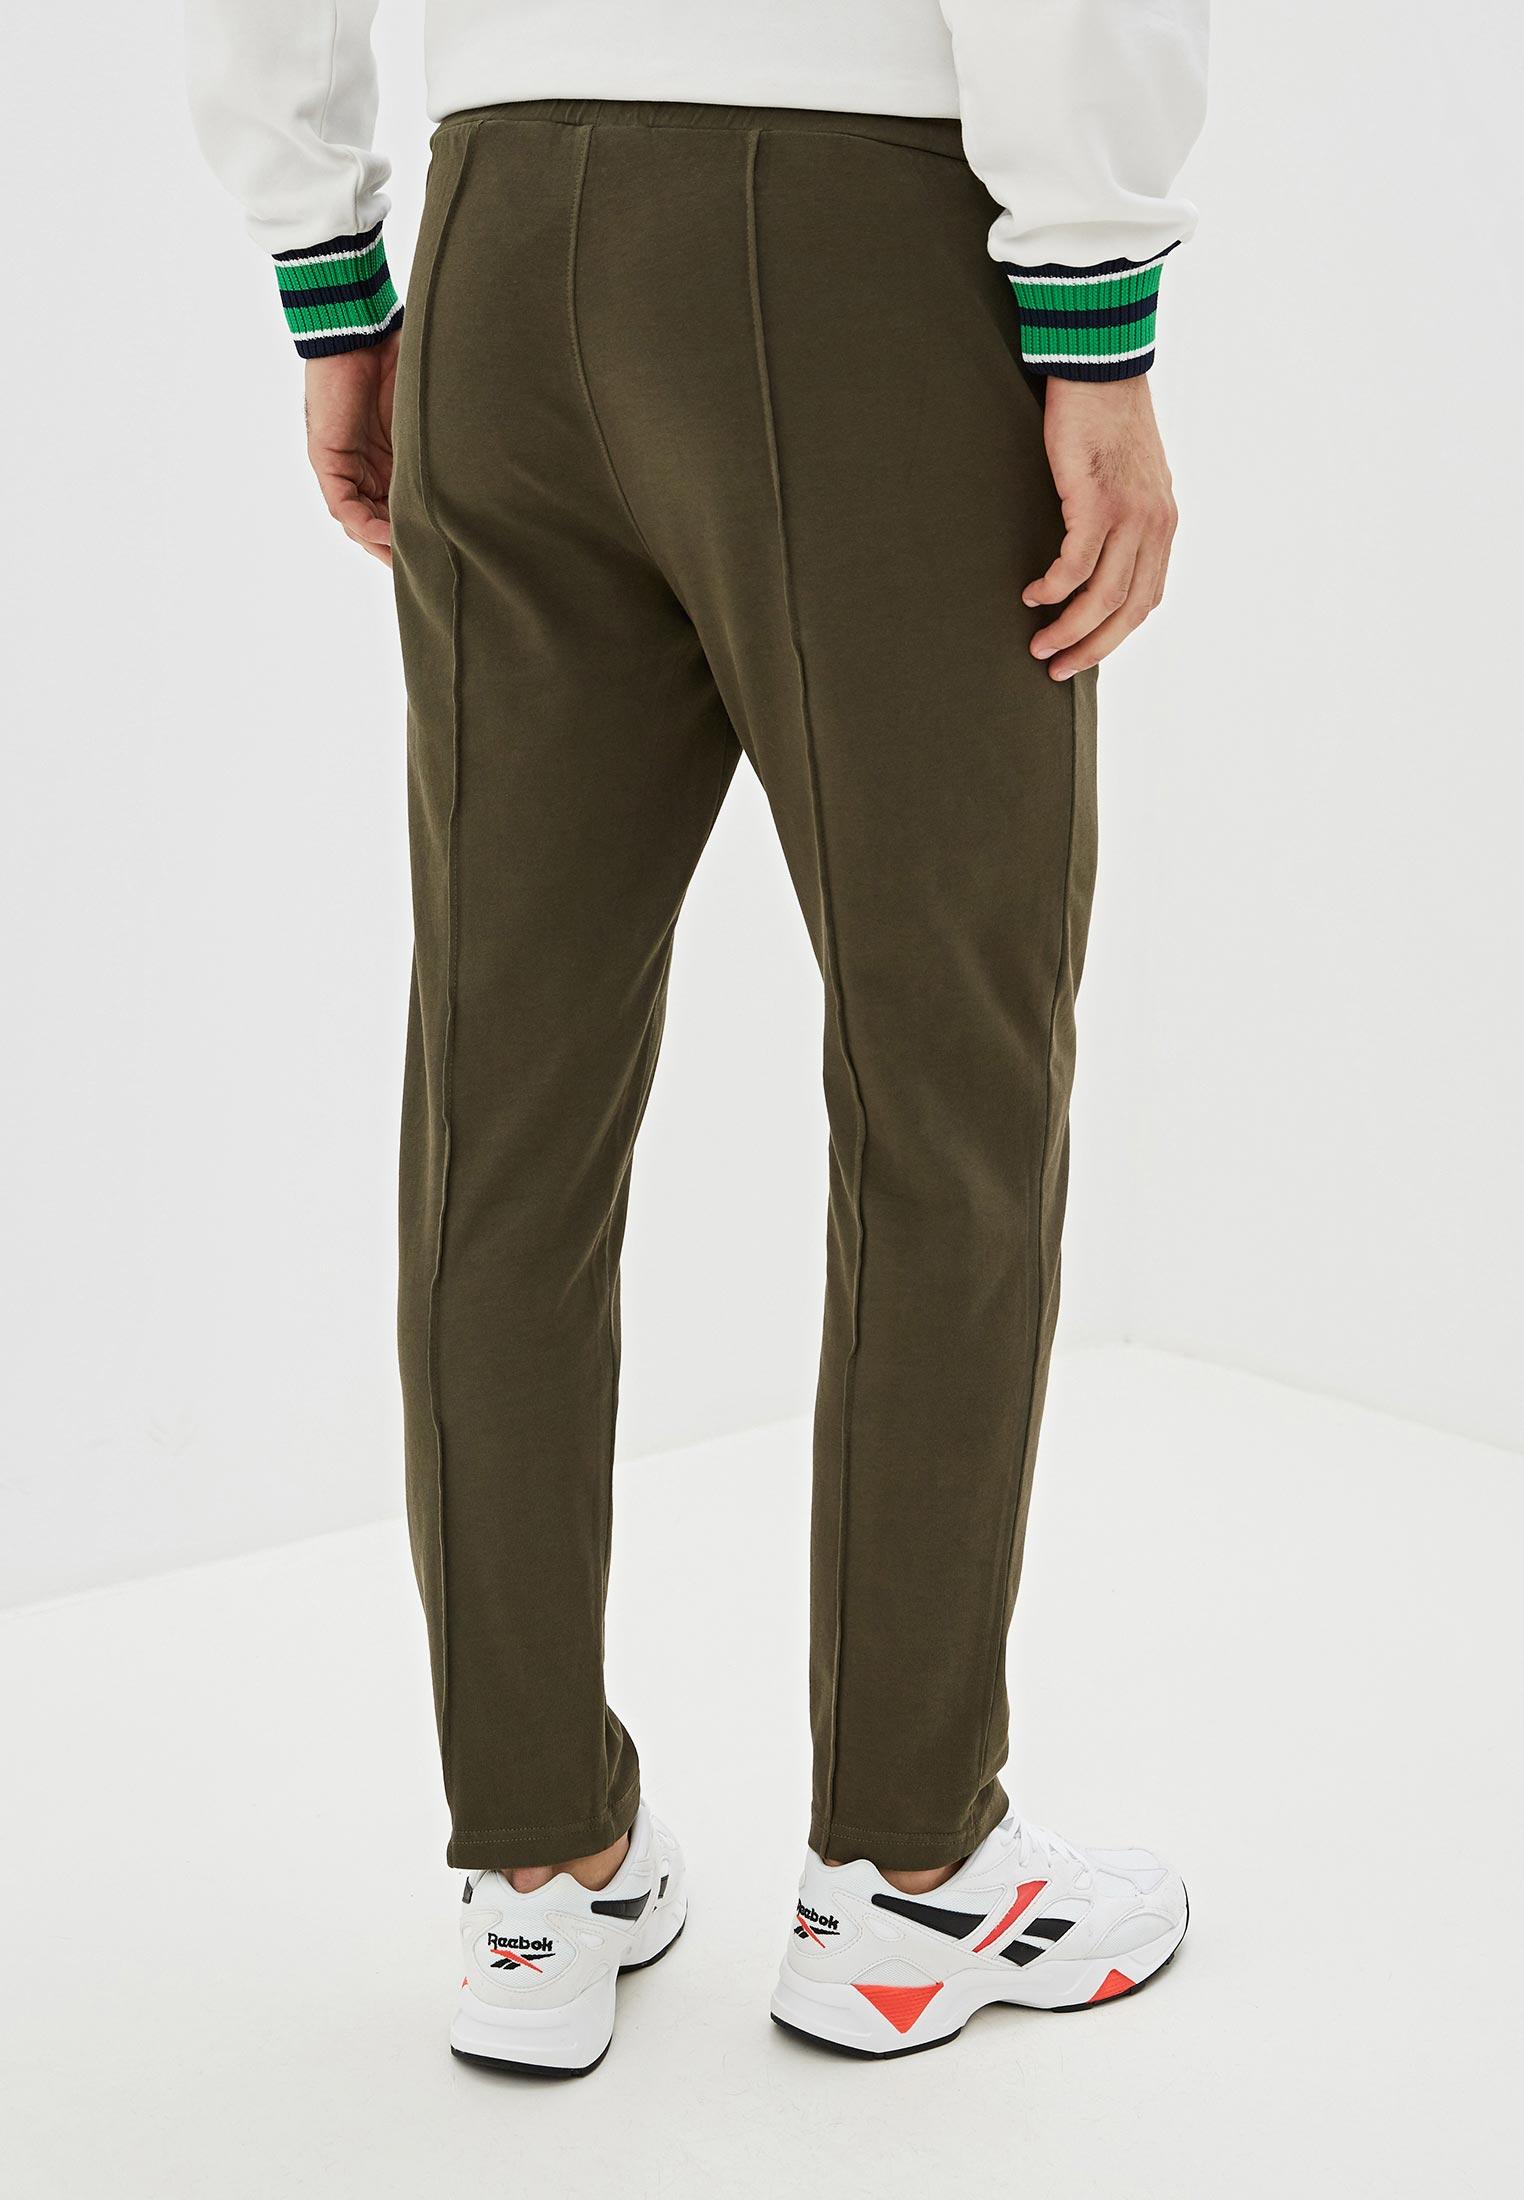 Мужские спортивные брюки United Colors of Benetton (Юнайтед Колорс оф Бенеттон) 3DQWP0436: изображение 3